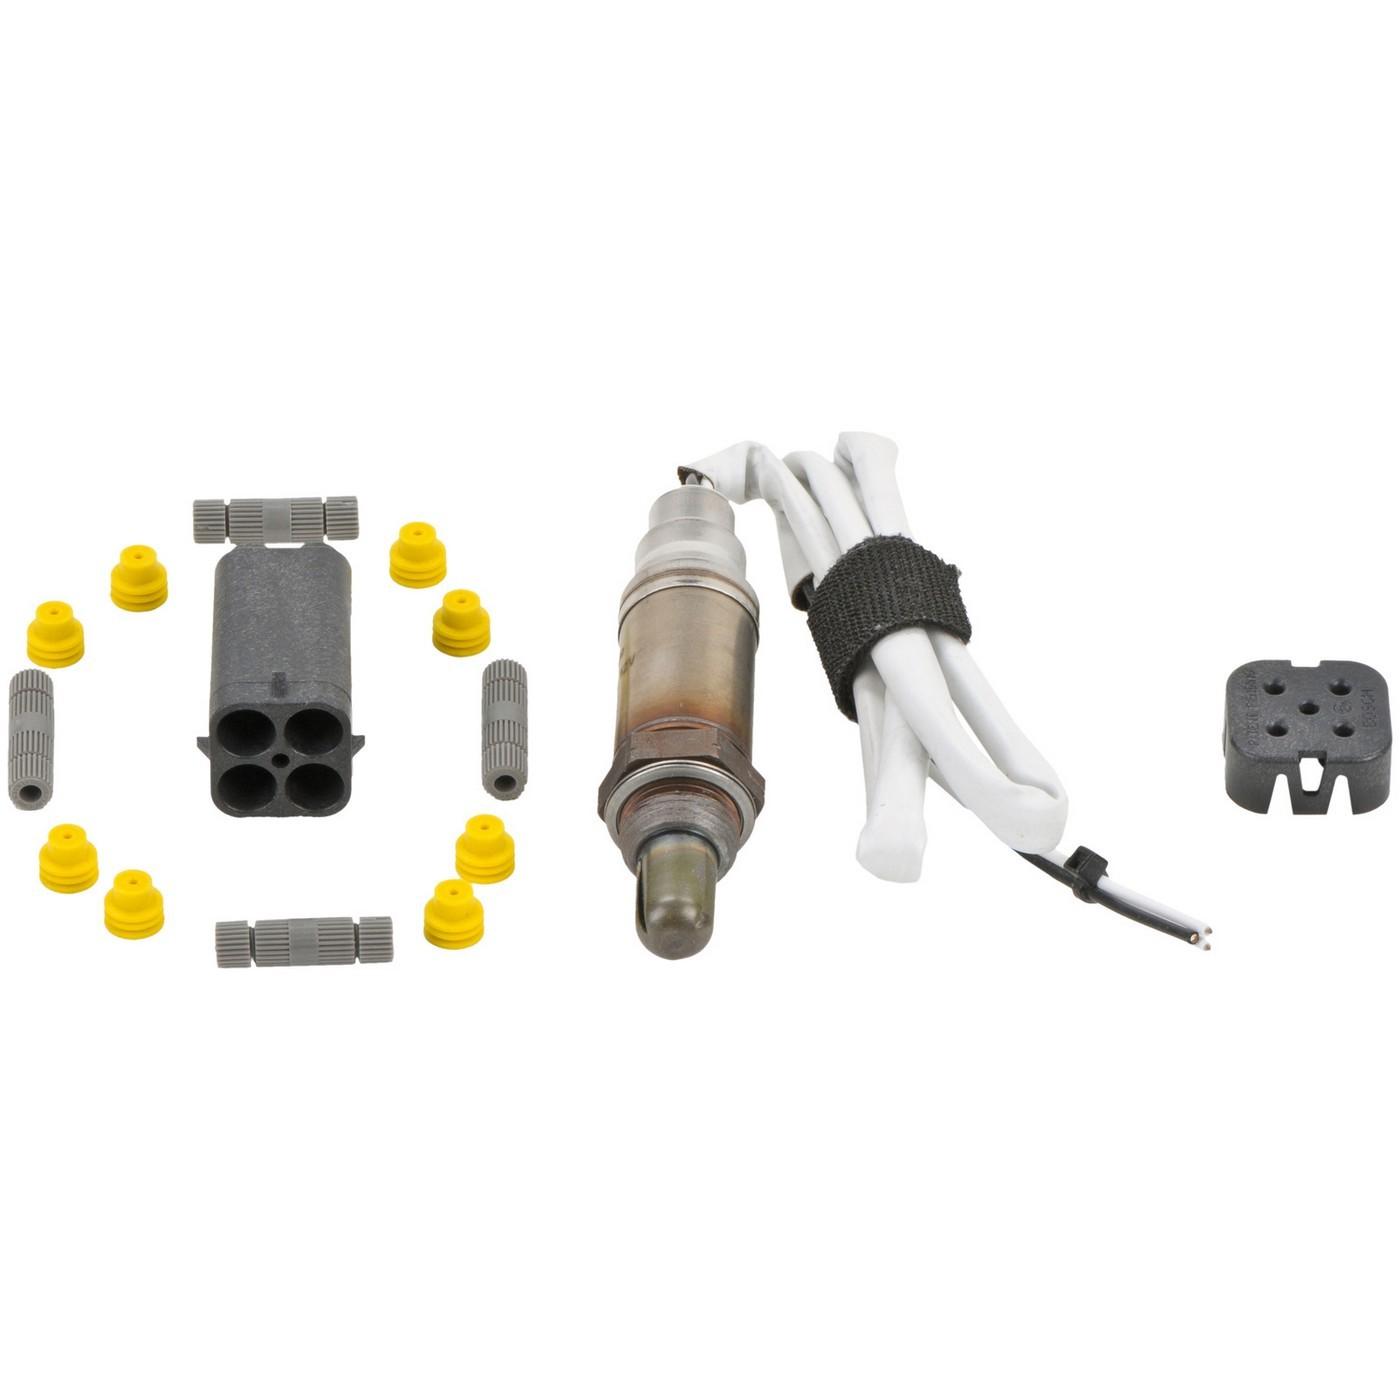 Bosch Oxygen Sensor Wiring Diagram Toyota Solutions Corolla Sensors 15725 Residential Electrical Symbols O2